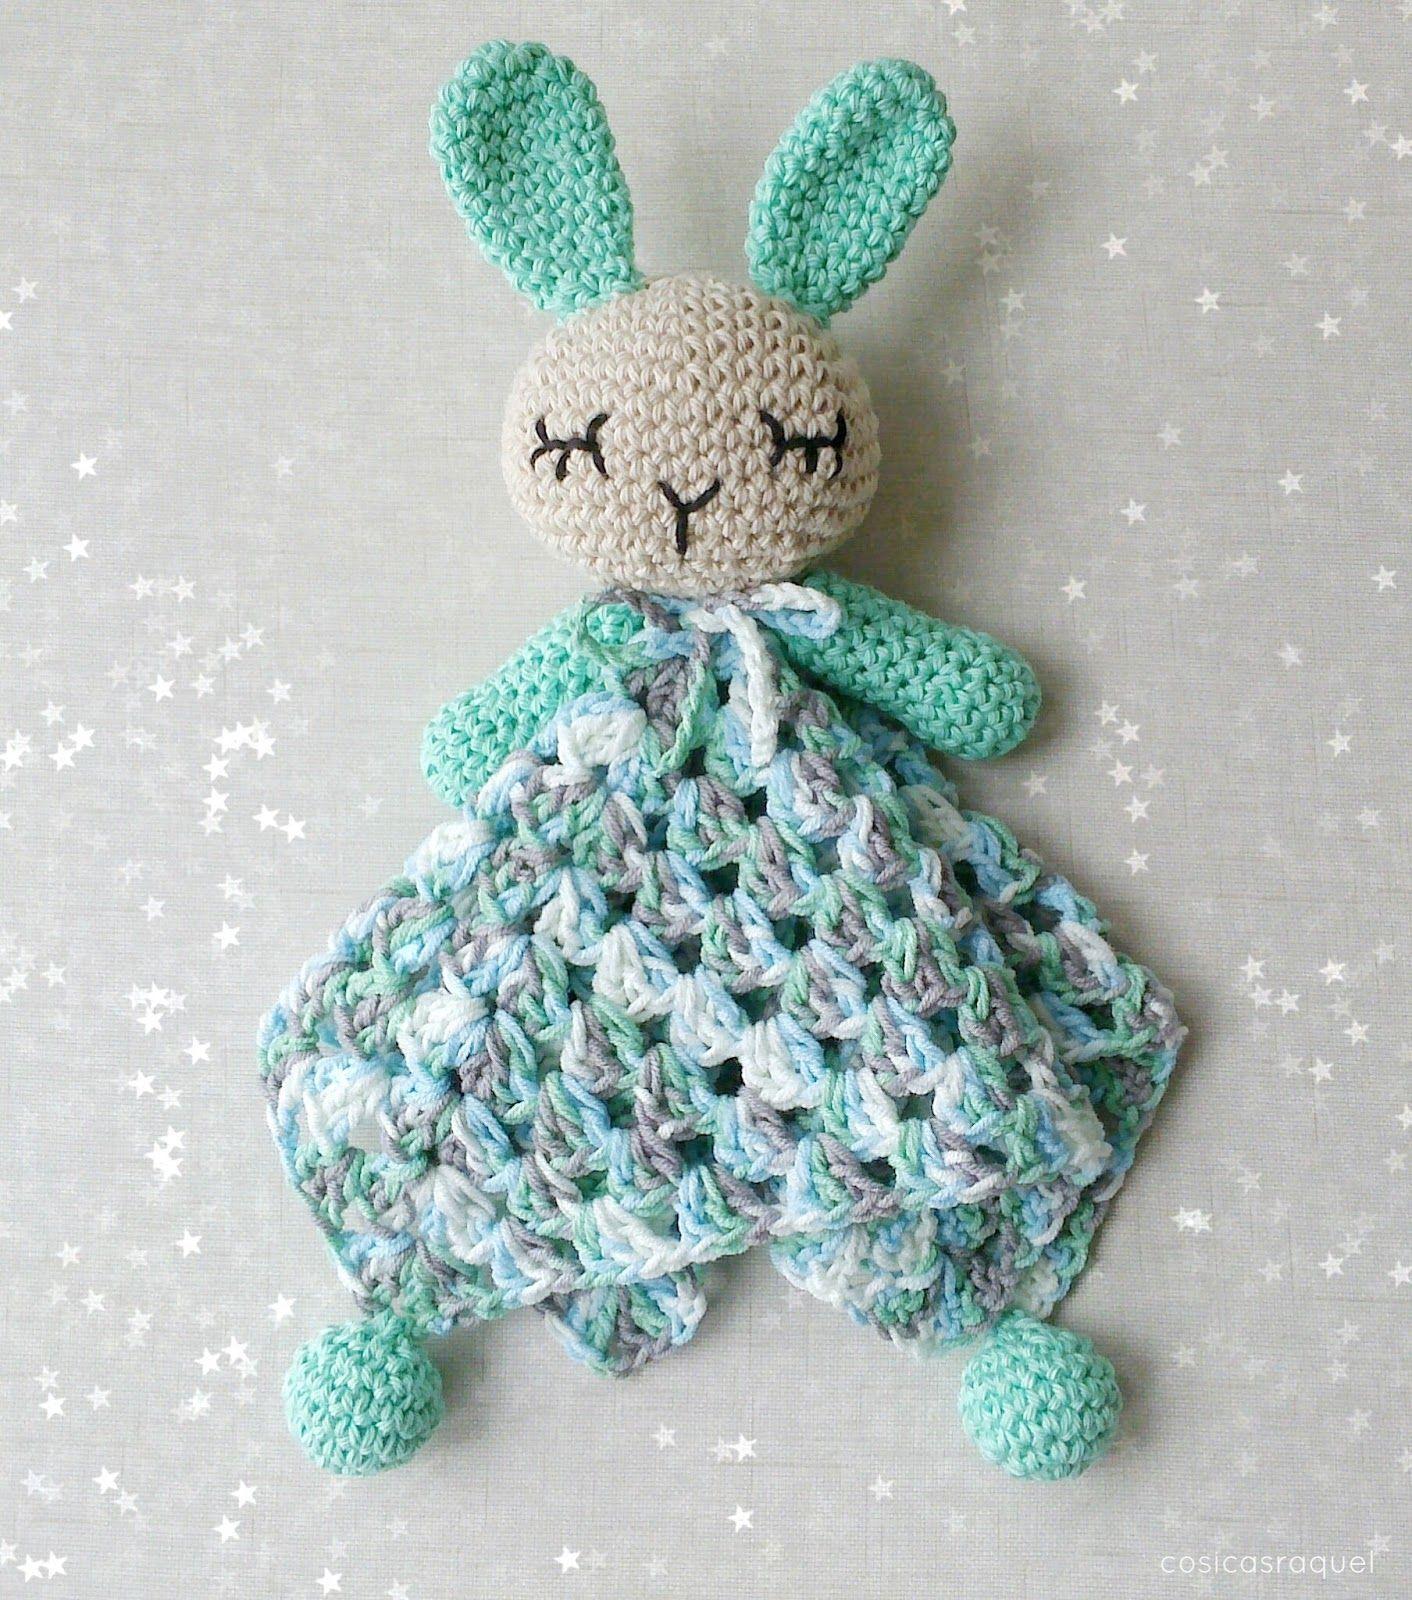 Pin de elvani en Mesas | Pinterest | Crochet patrones, Patrón gratis ...